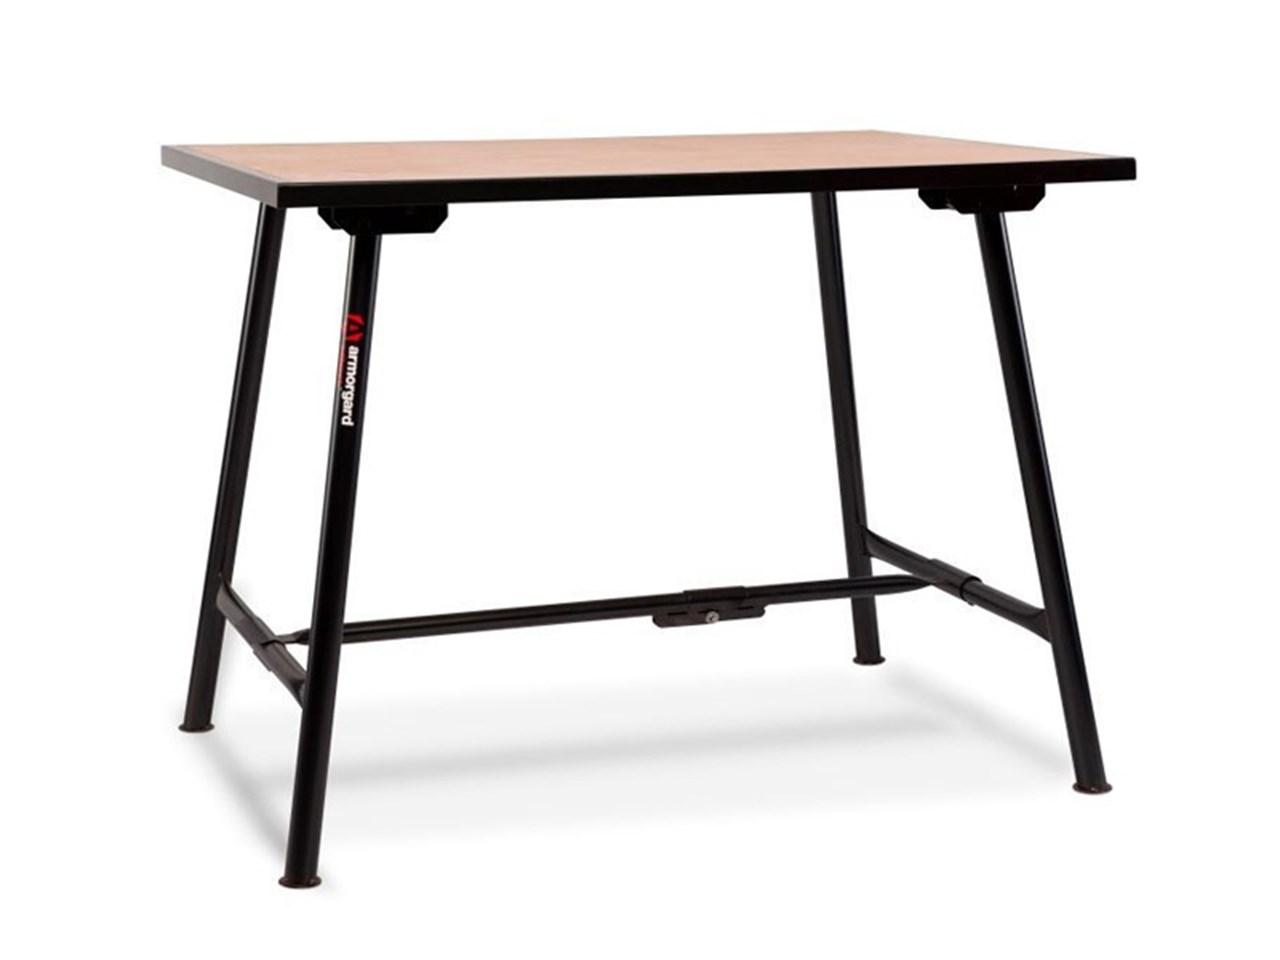 Armorgard Bh1080 Tuffbench 1080x750x820mm Folding Work Table